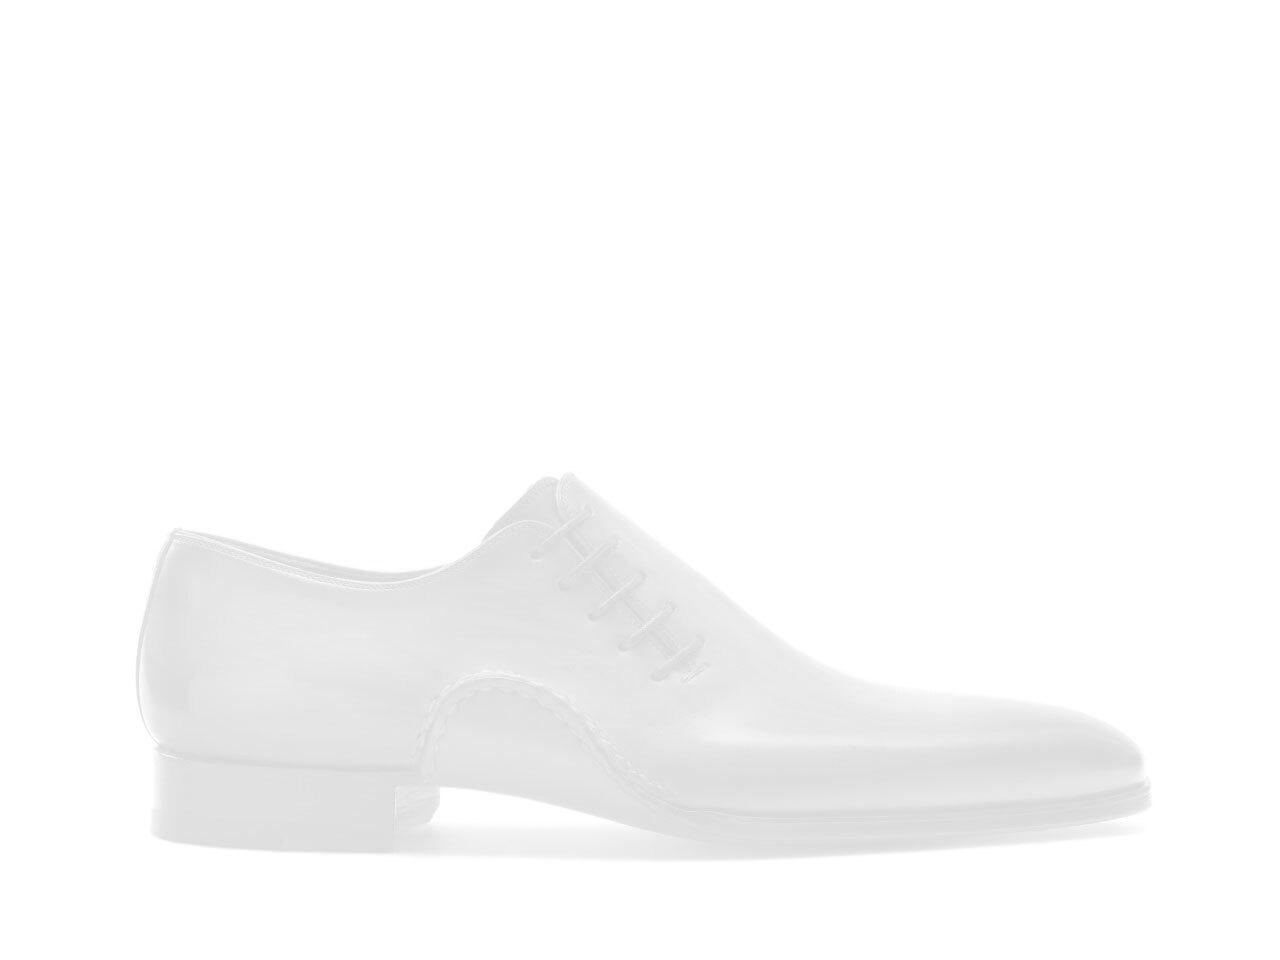 Sole of the Magnanni Capela White Men's Sneakers